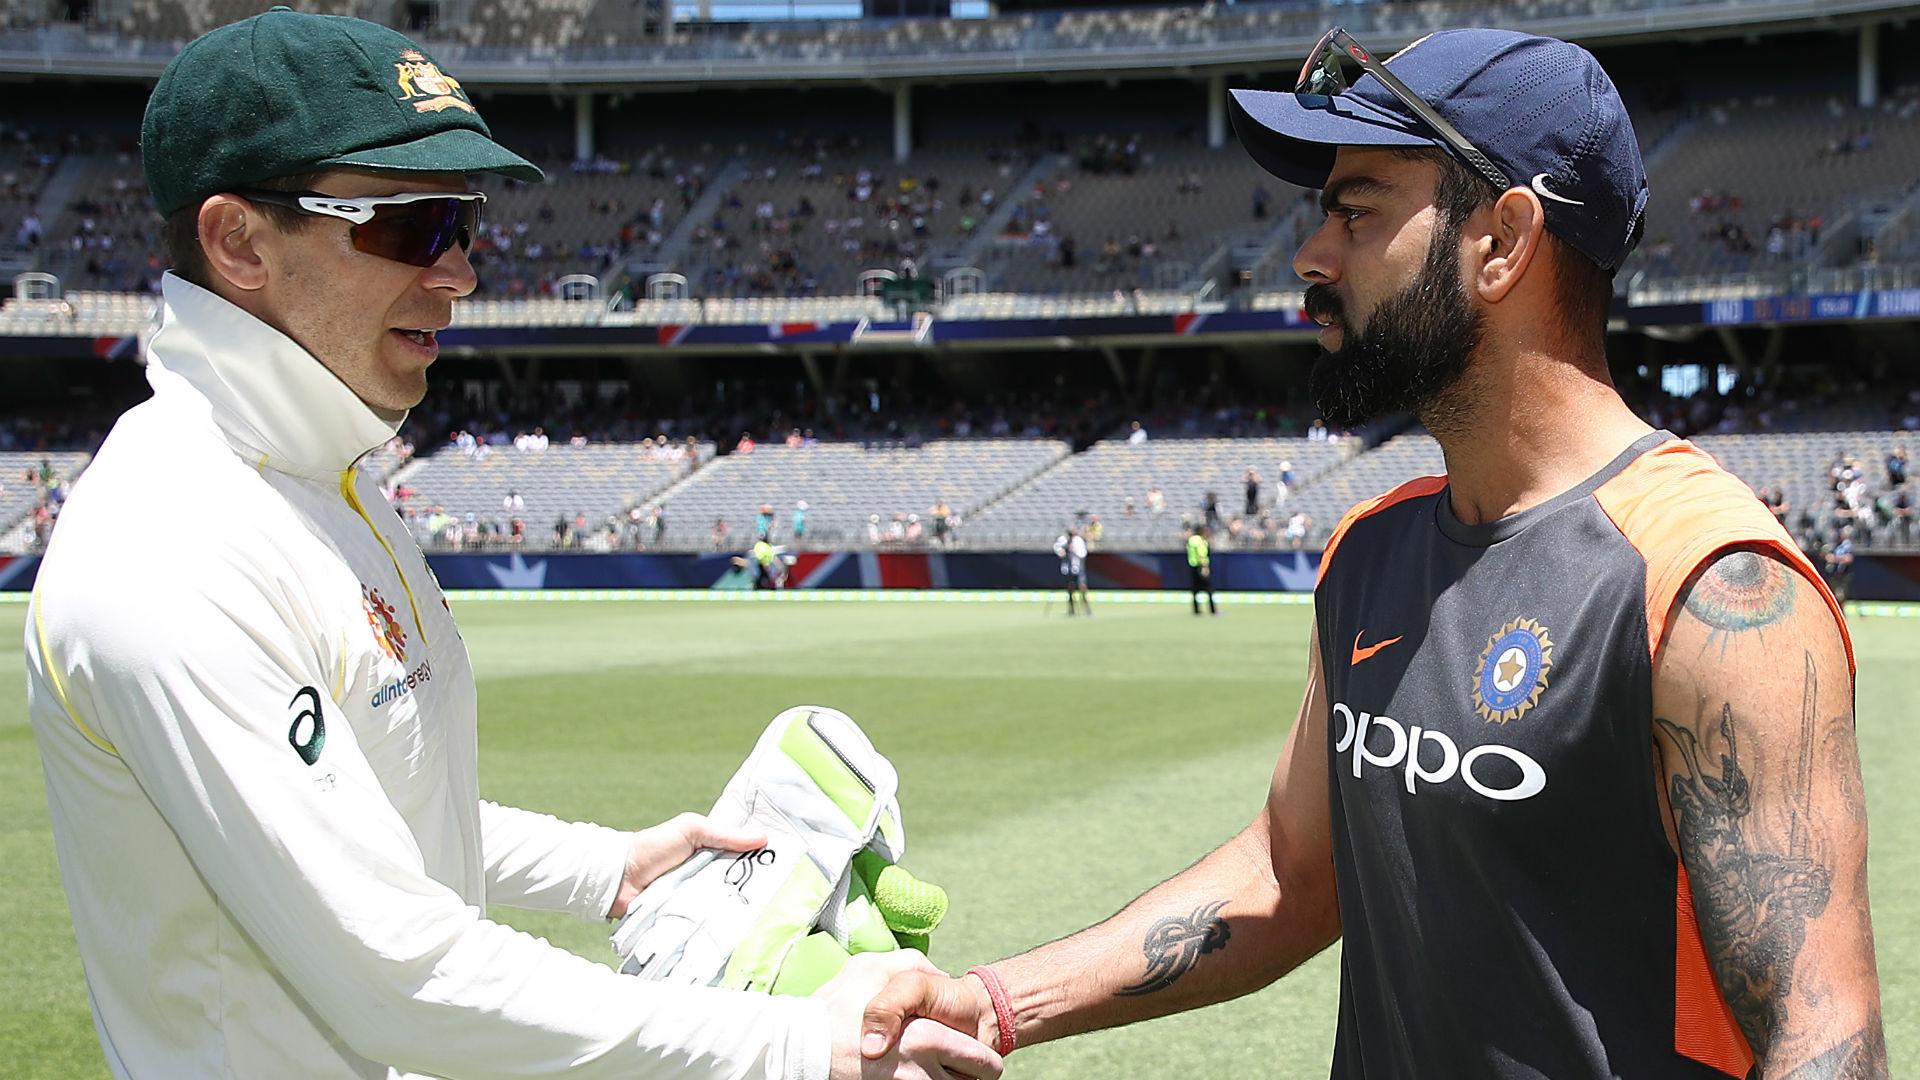 Paine takes aim at India captain Kohli after Australia crush Pakistan